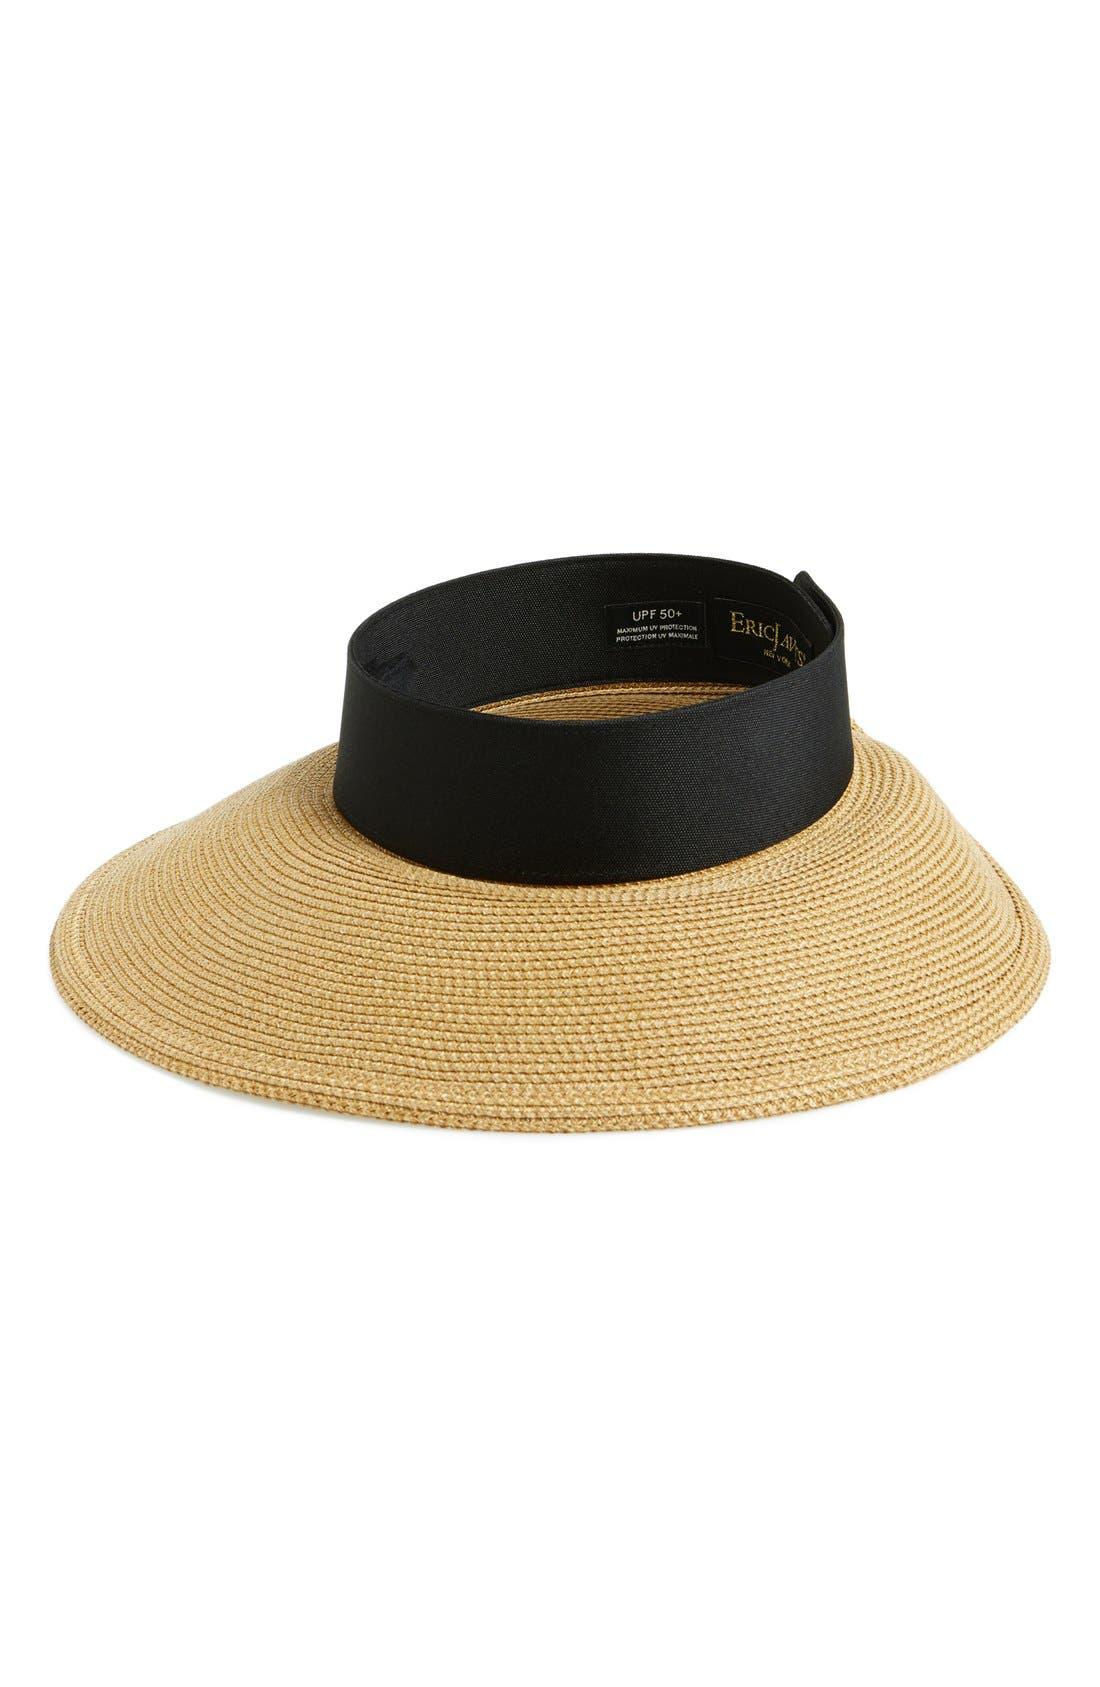 ERIC JAVITS 'Squishee<sup>®</sup> Halo' Hat, Main, color, NATURAL/ BLACK